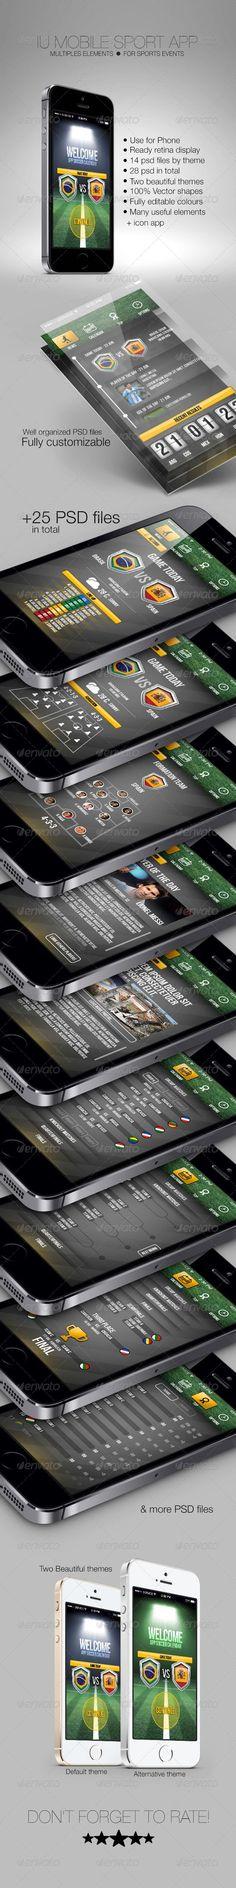 Free IU Mobile Sport App. Link: http://graphicriver.net/item/iu-mobile-sport-app-/7119395. [Link expires in a month]: